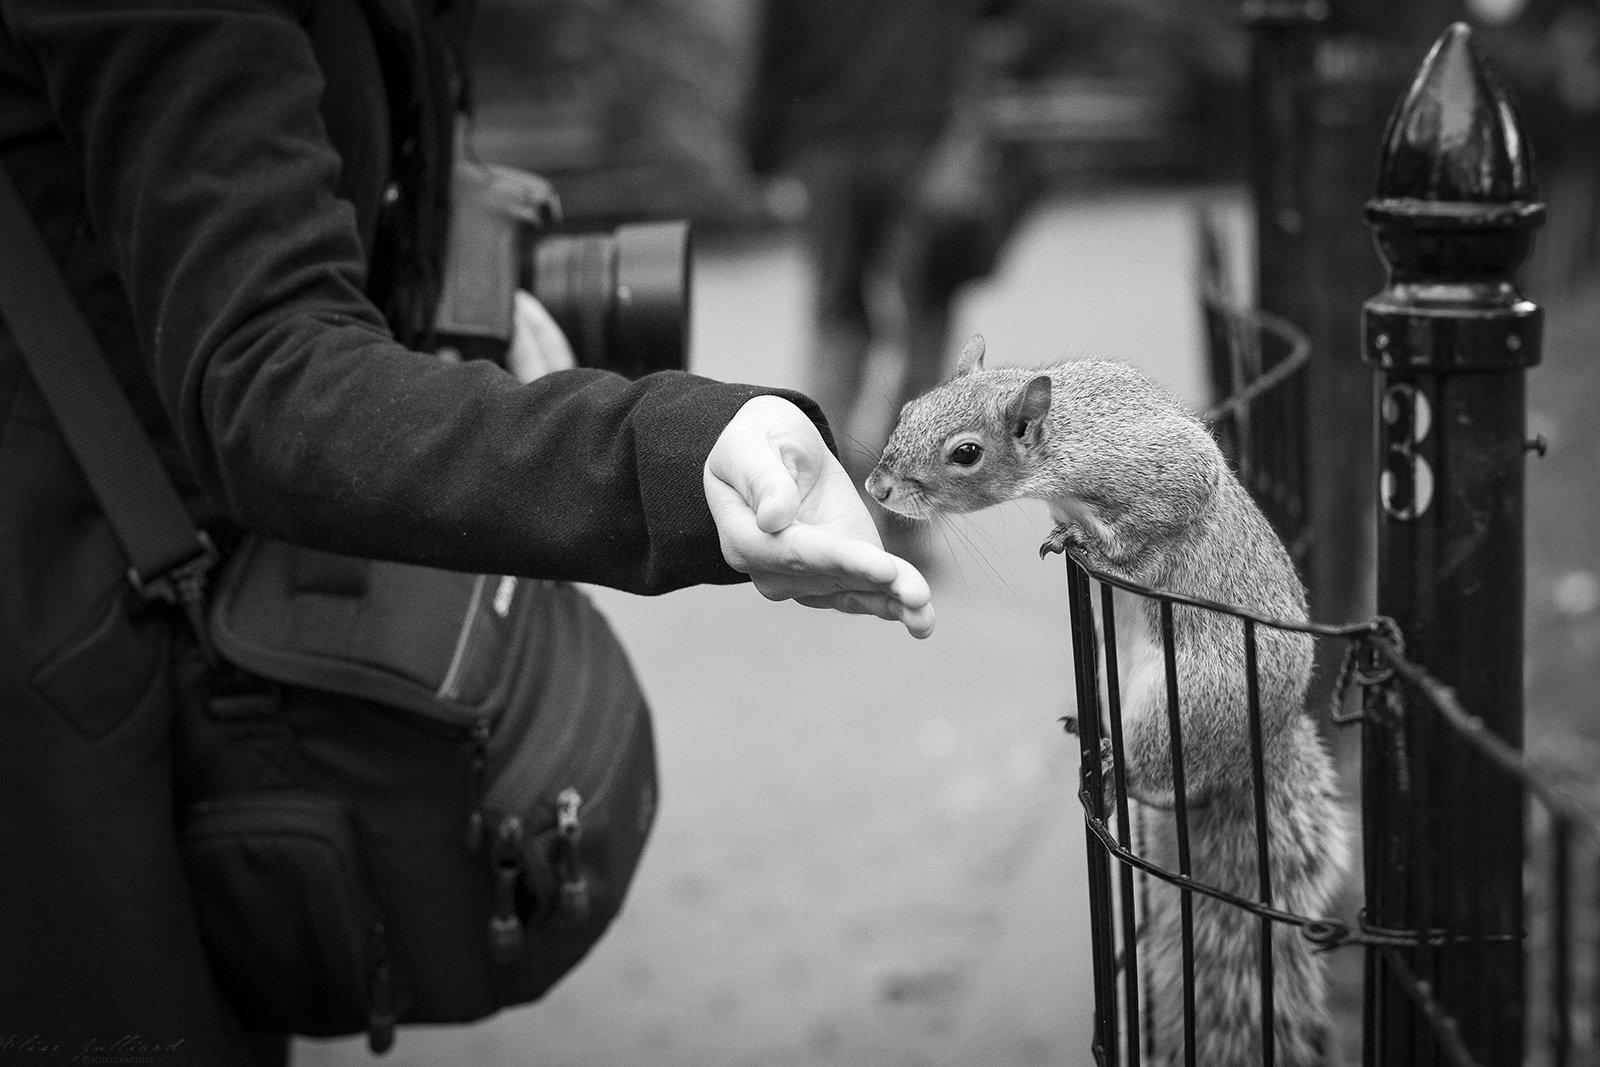 elise-julliard-photographe-ecureuil-gris-squirrel-madison-square-new-york-etats-unis